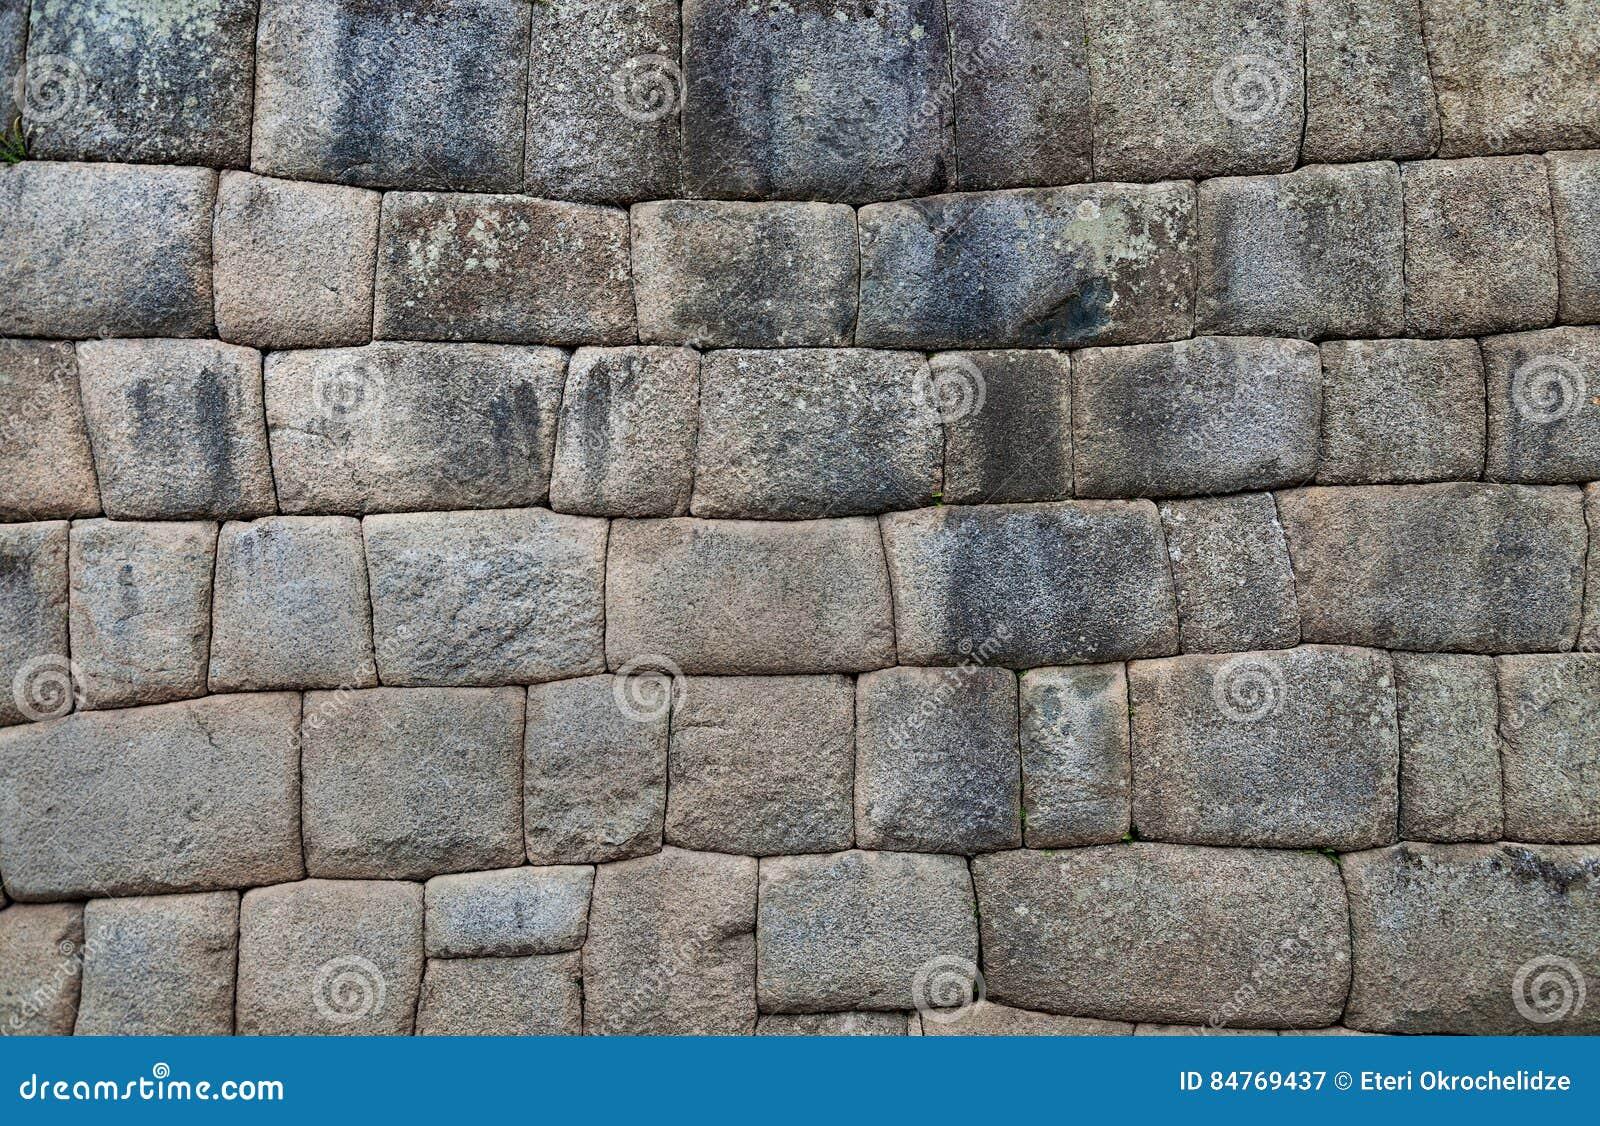 Inkawand im Dorf Machu-Picchu, Peru, Südamerika